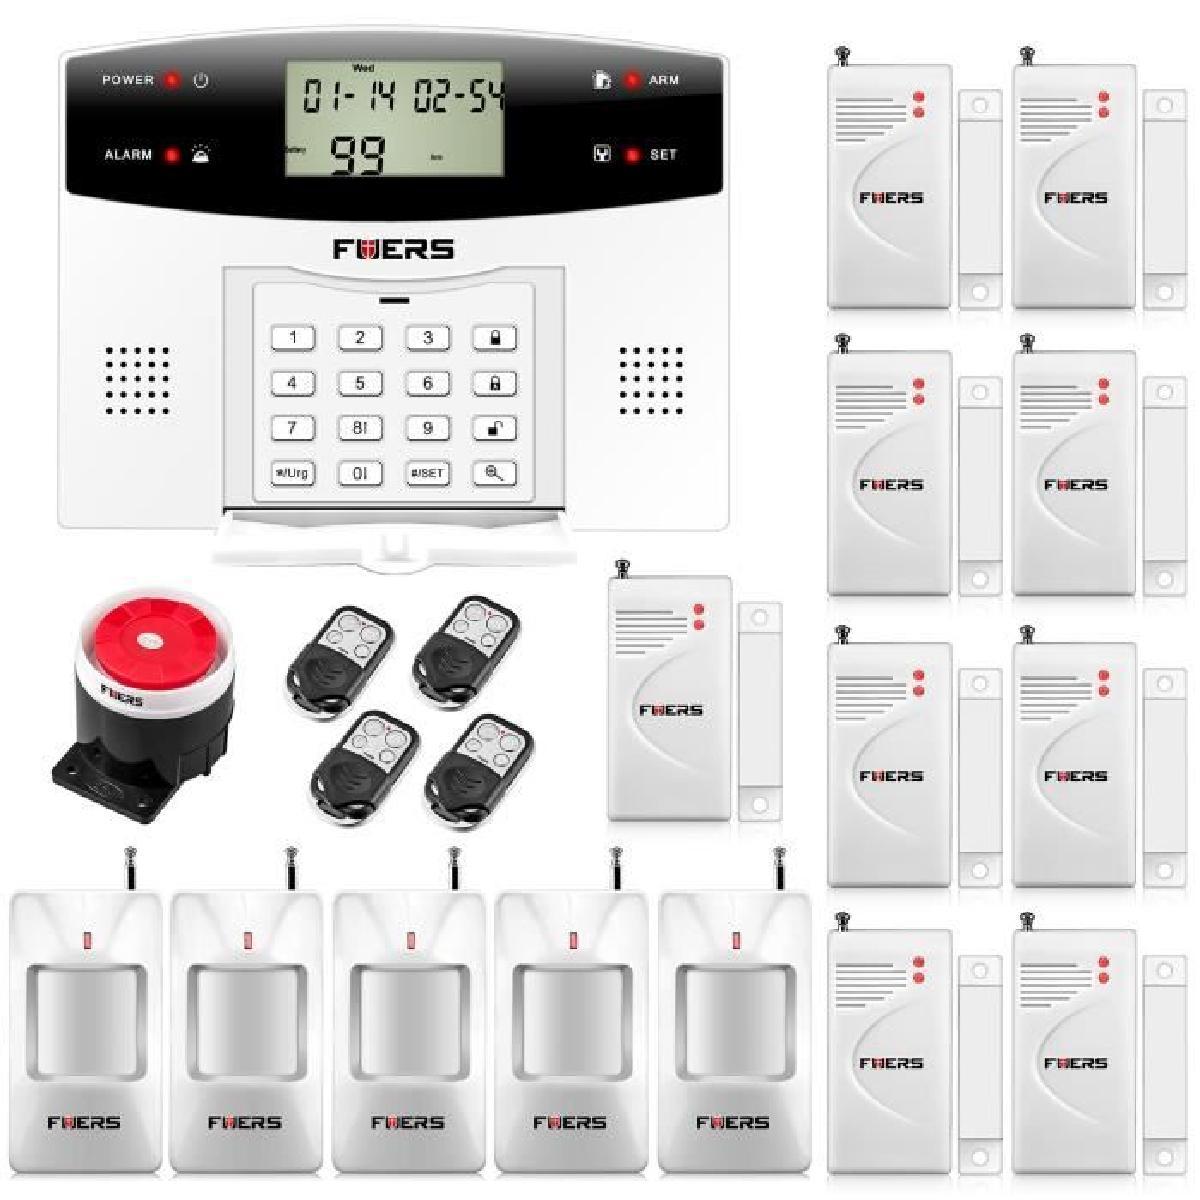 Alarme sans fil kit alarme - Telesurveillance maison comparatif ...